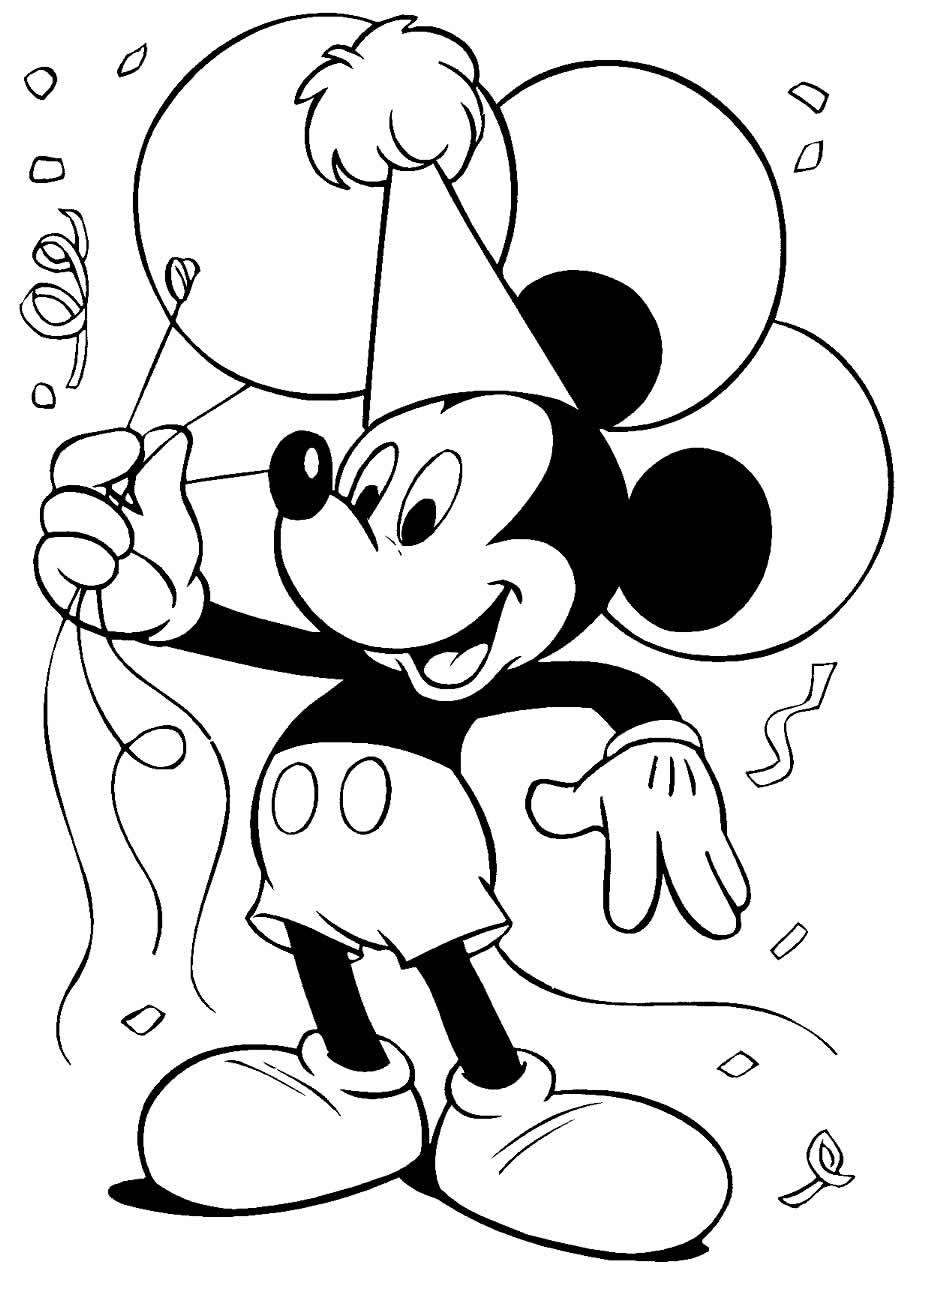 Desenho legal do Mickey Mouse